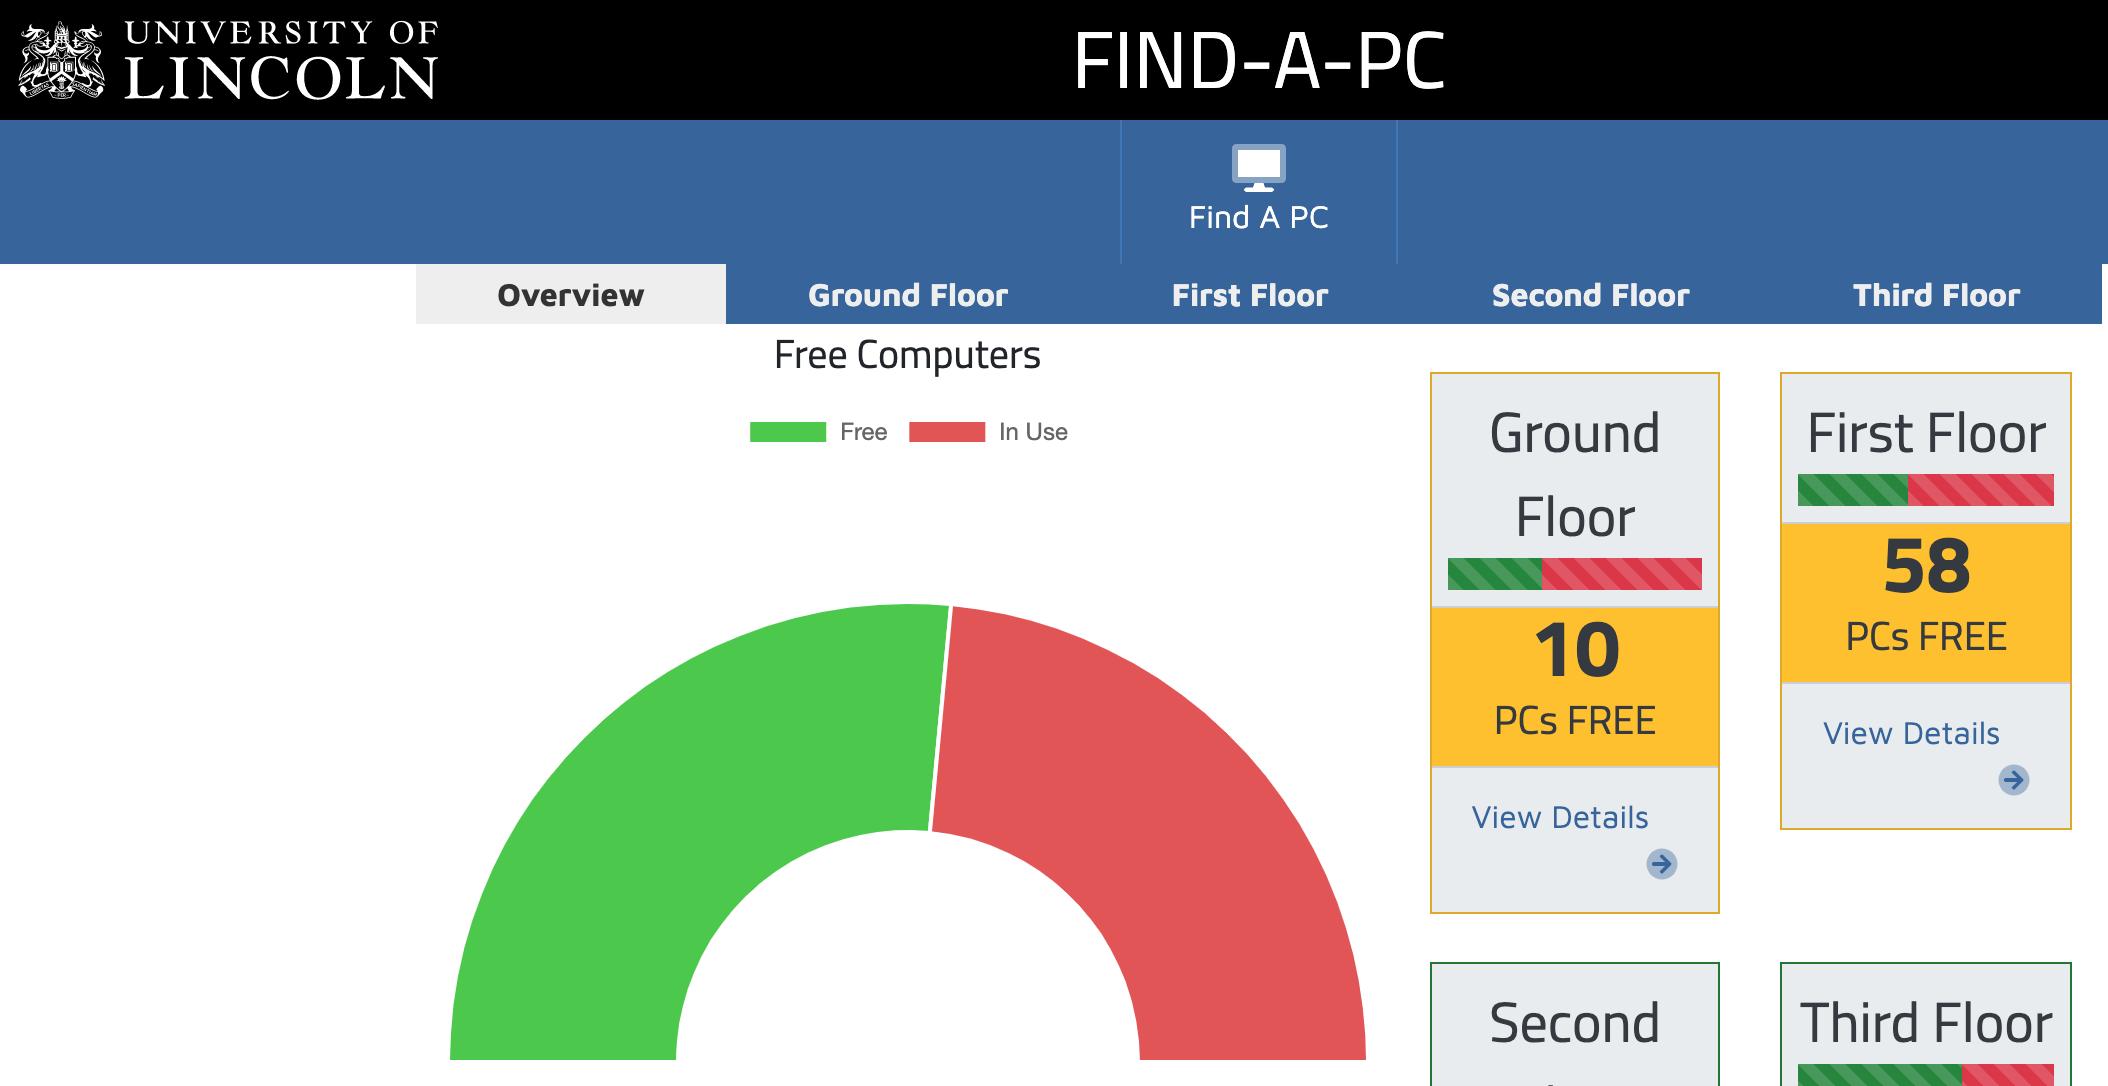 Find-A-PC